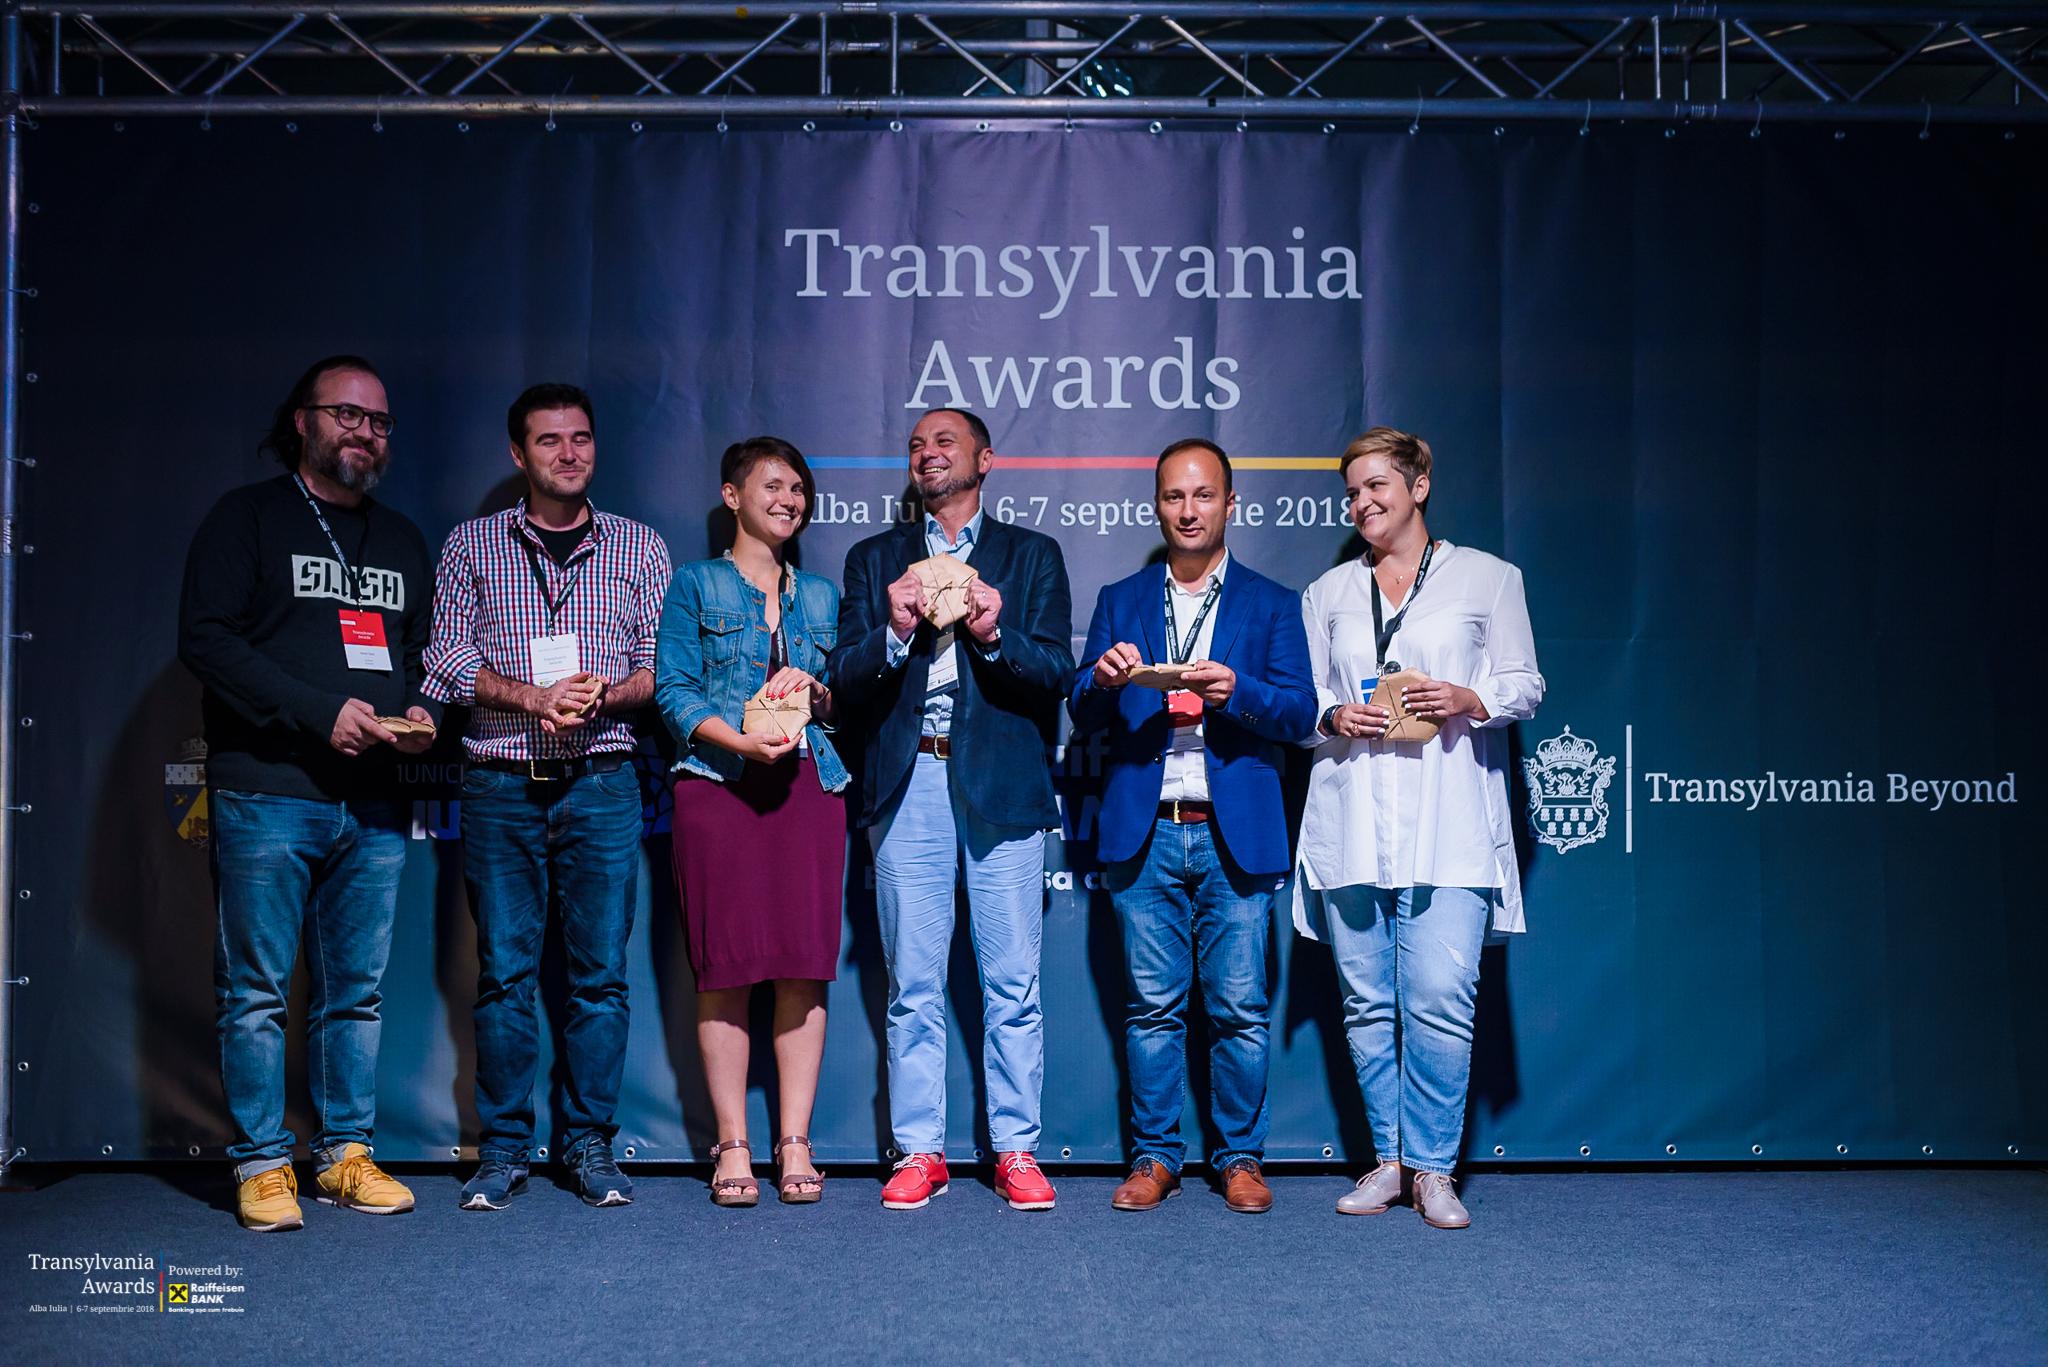 transylvania awards septembrie 2018_06_09_2018_Vlad Cupsa_VL2_1339.jpg